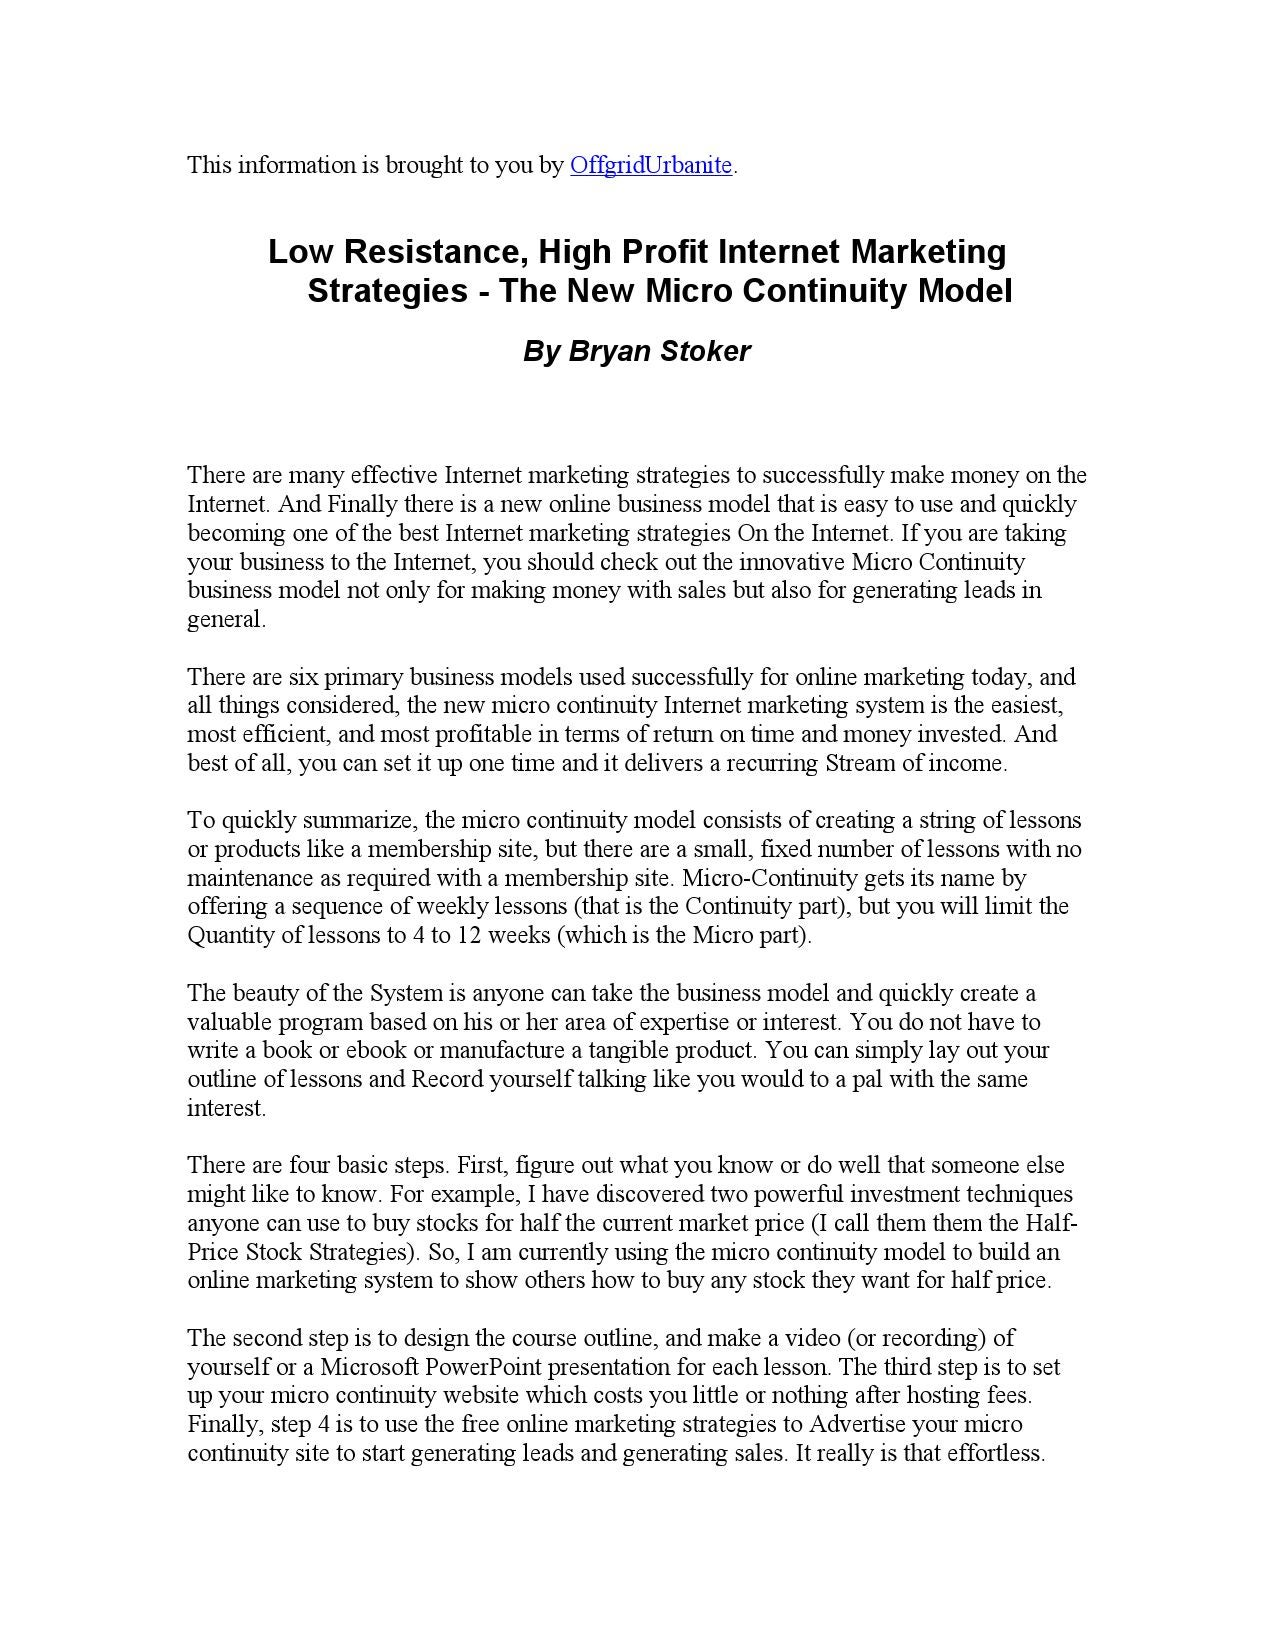 Low Resistance, High Profit Internet Marketing Strategies by